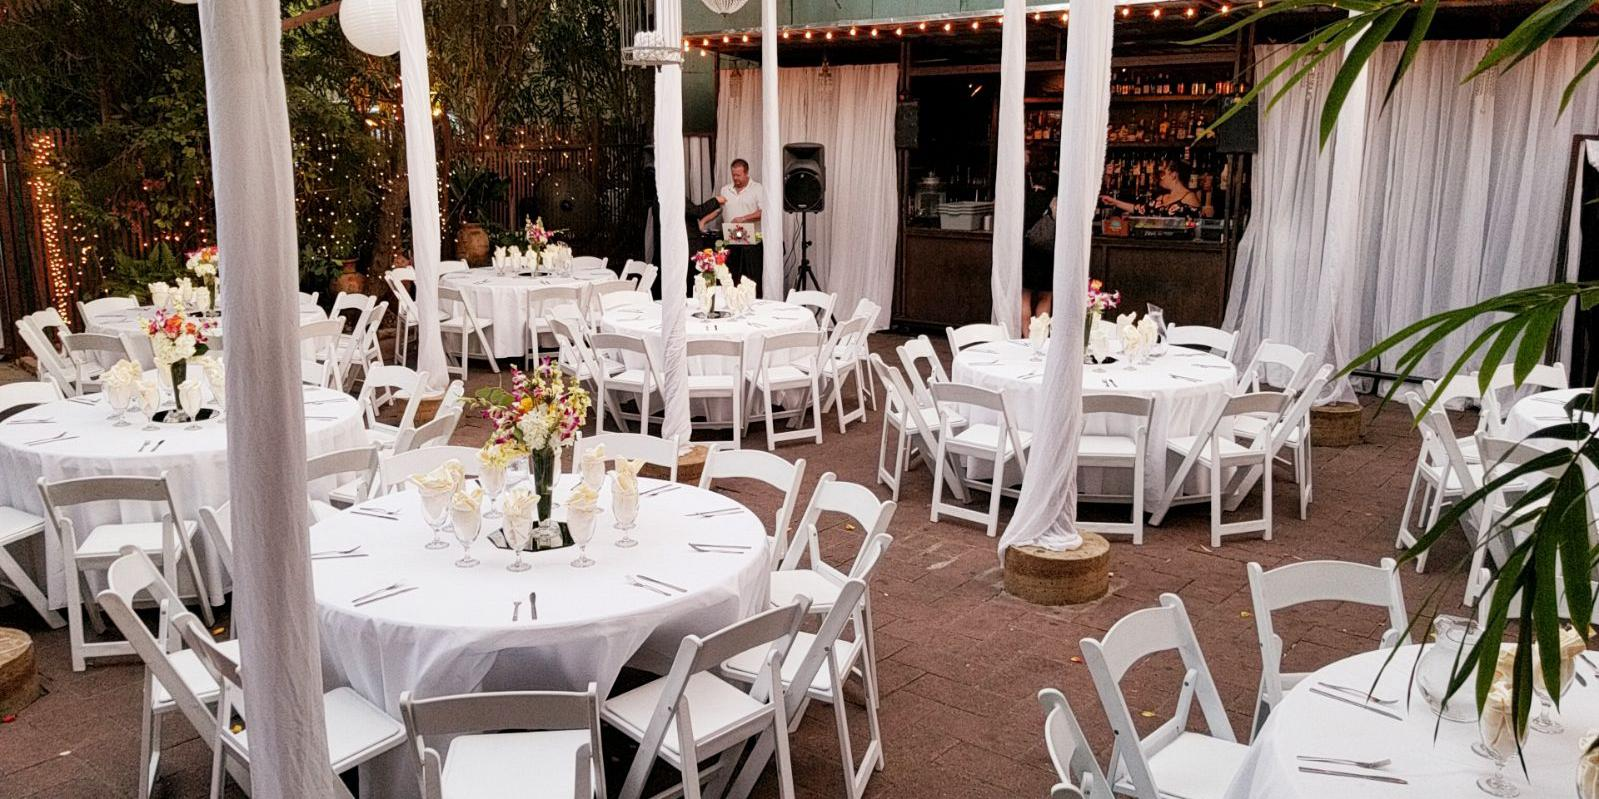 Weddings At Avantgarden Venue Houston Price It Out